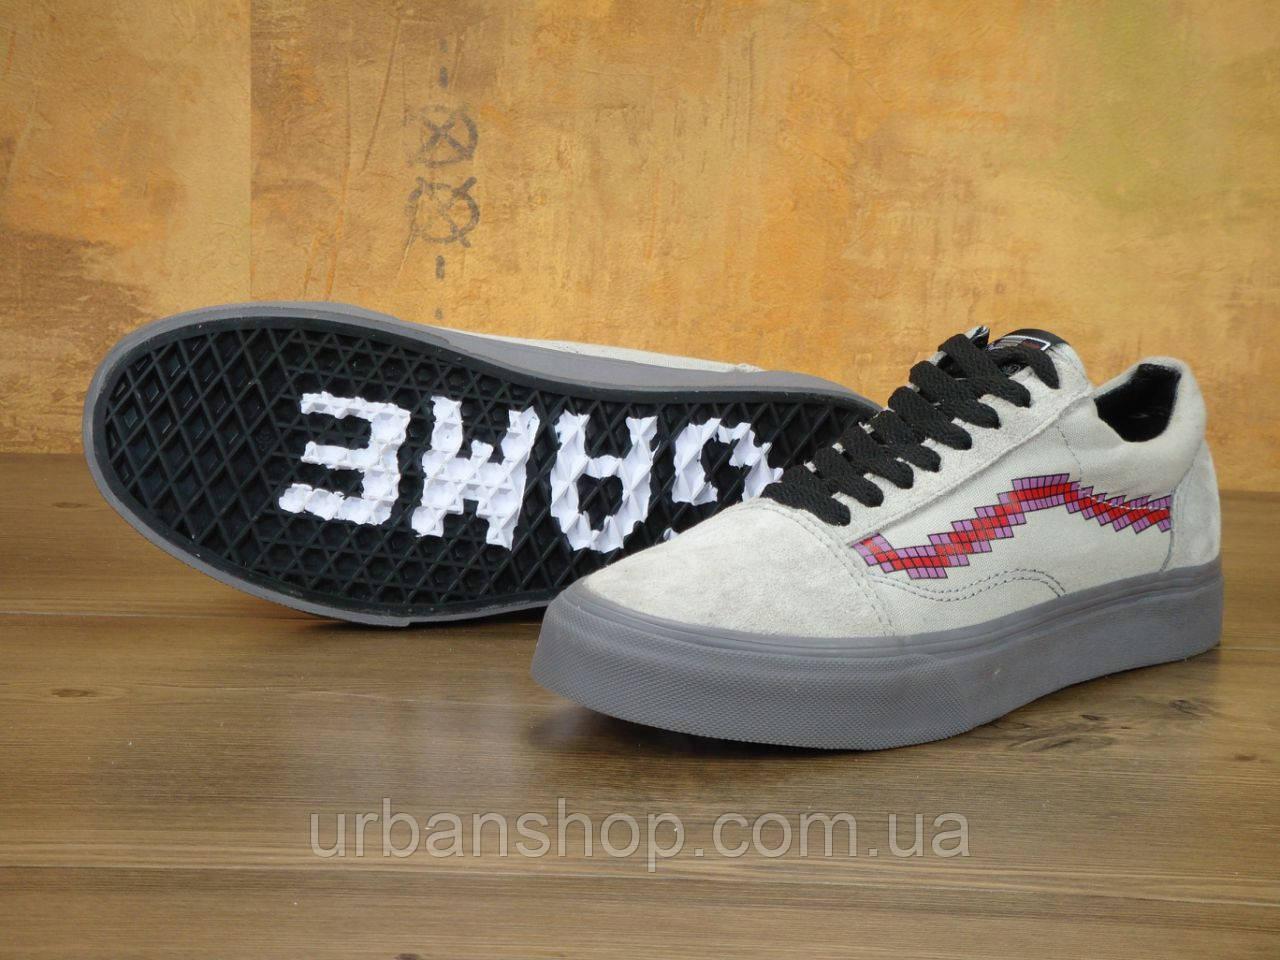 Кеды Vans Old Skool NINTENDO 36-45 рр